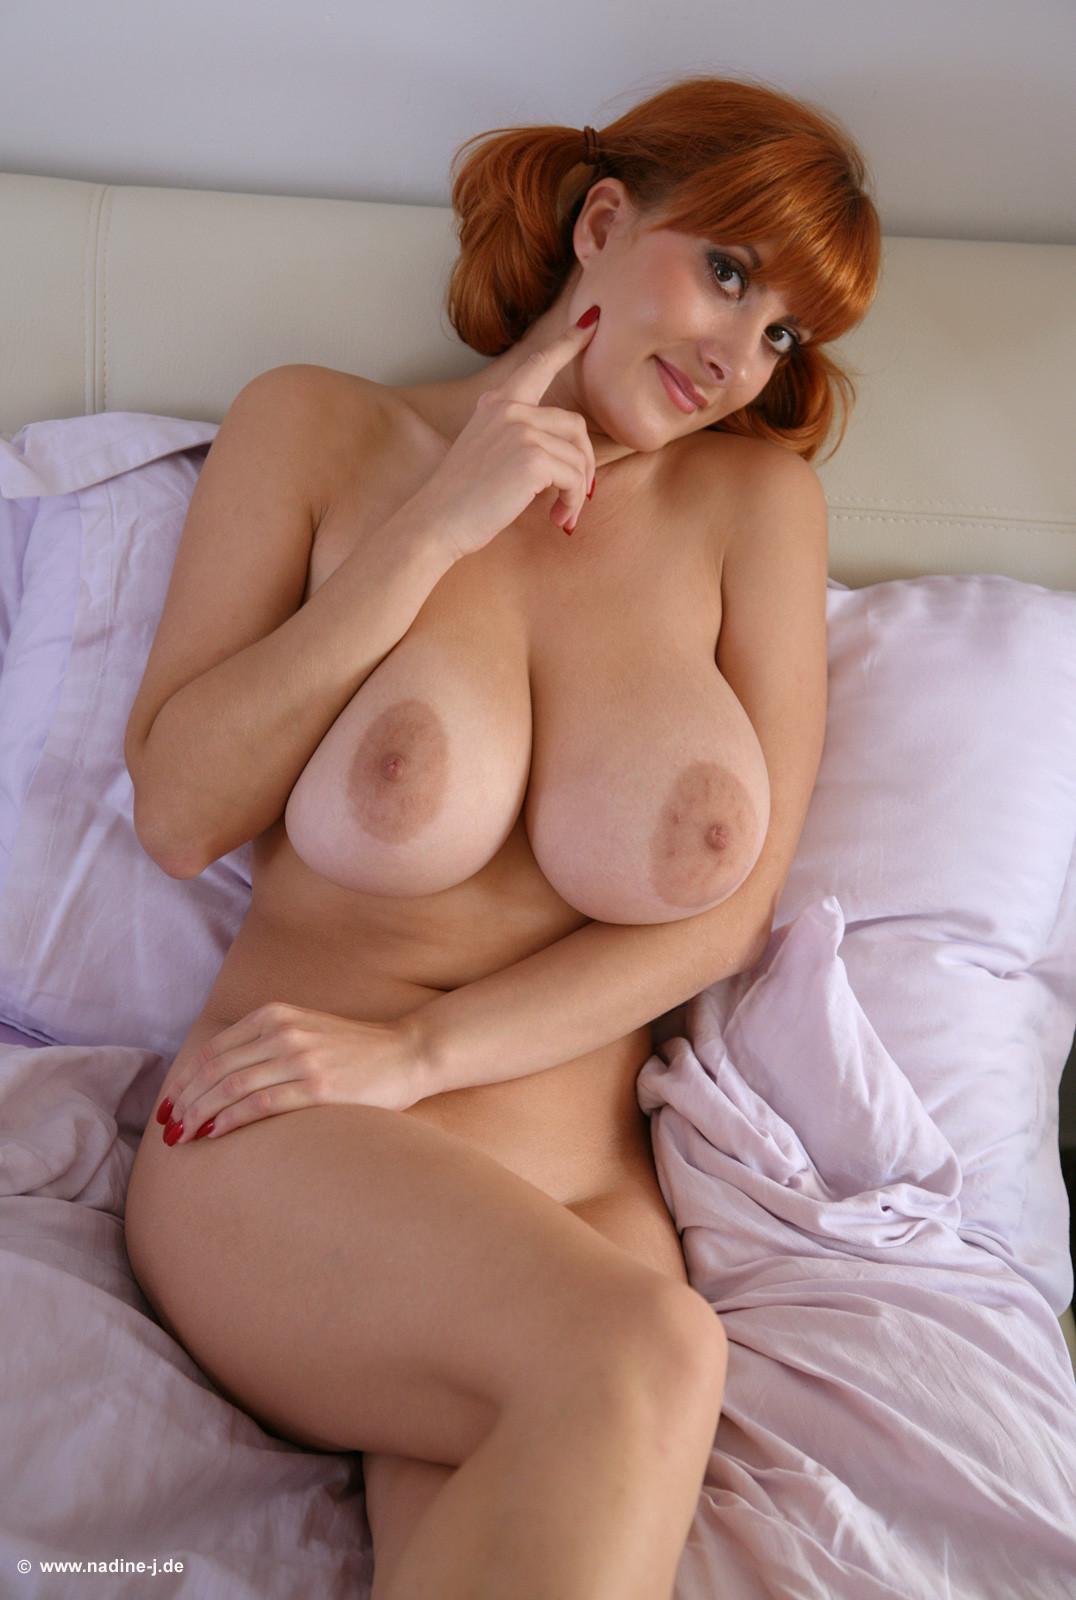 Sexy sweaty busty nude redhead mom